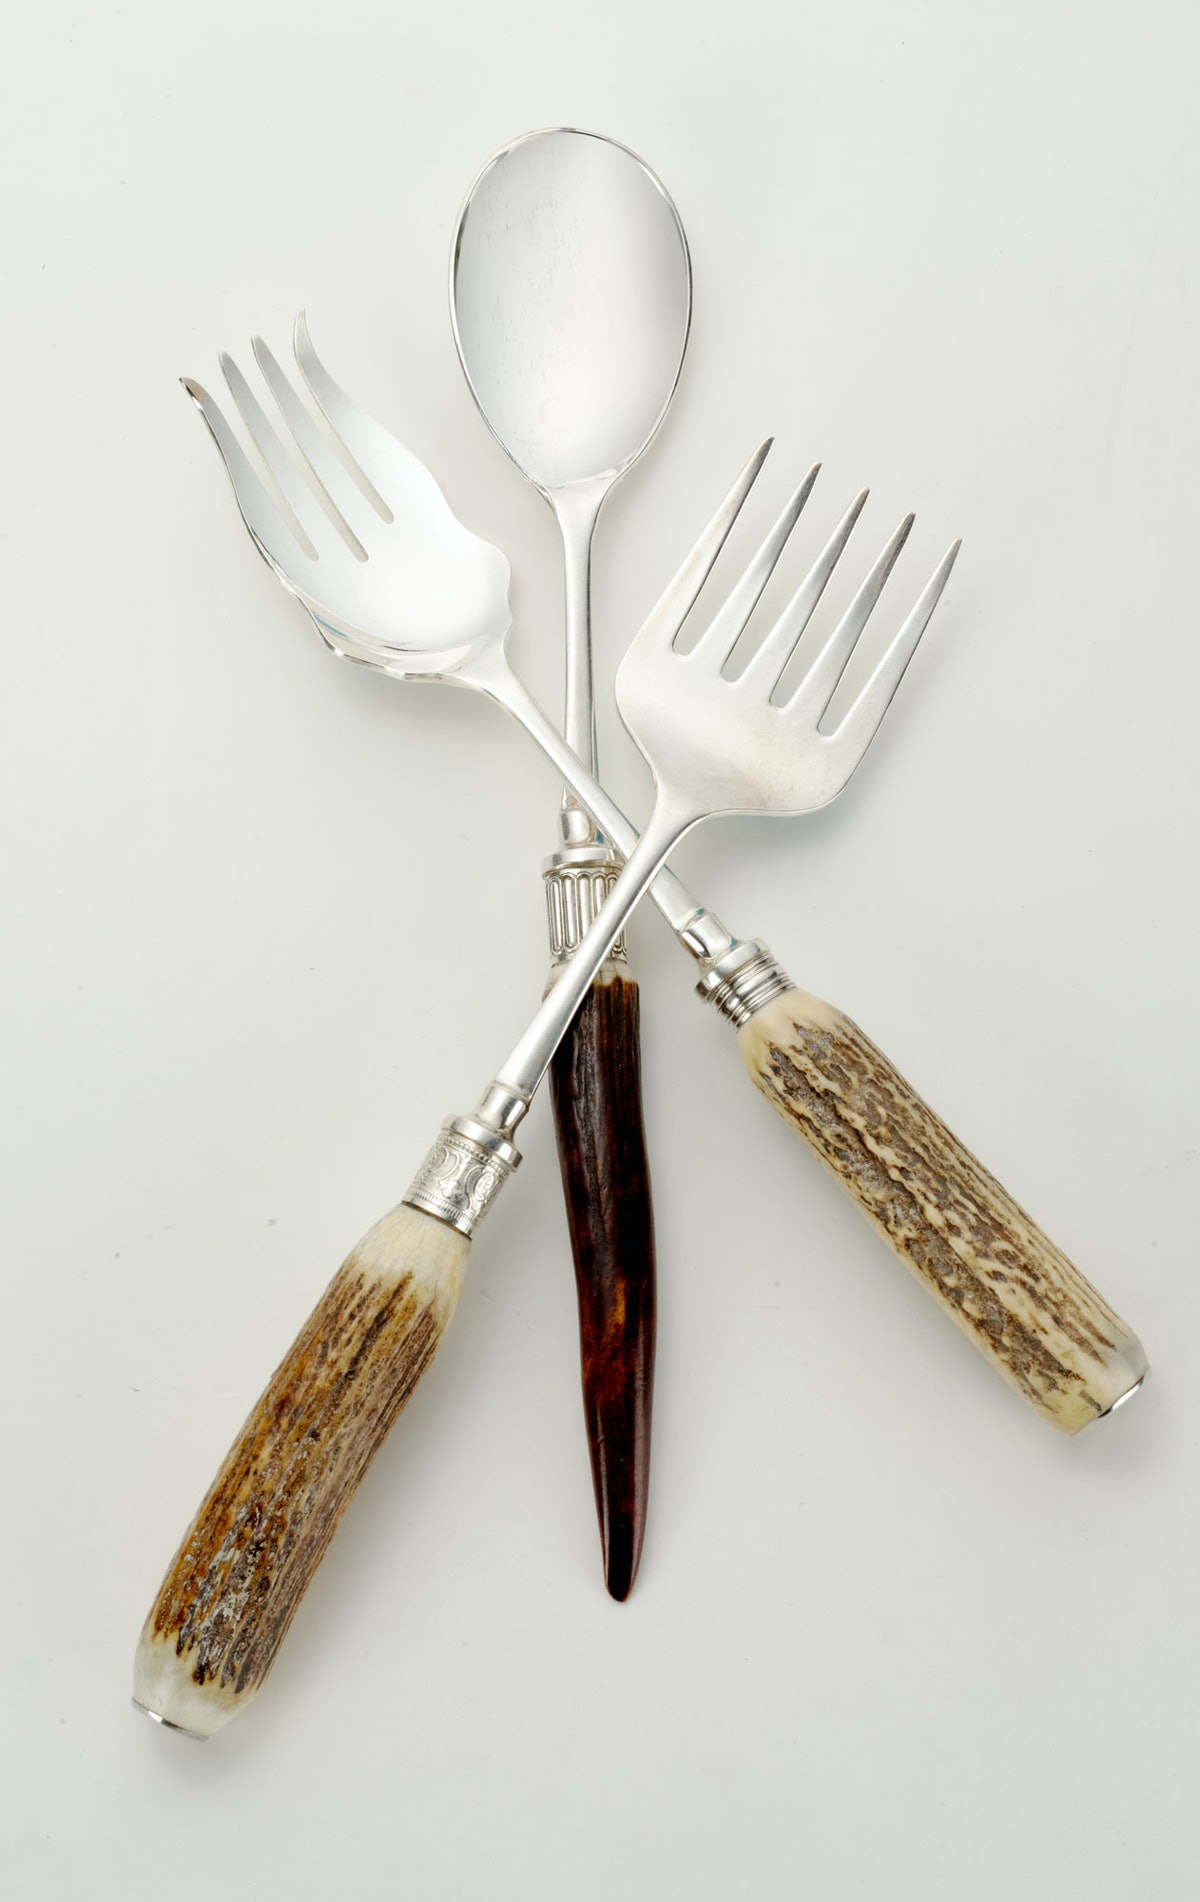 Lynn G. Feld Antiques serving utensils, $295–$495, Bergdorf Goodman, New York, 212.753.7300.